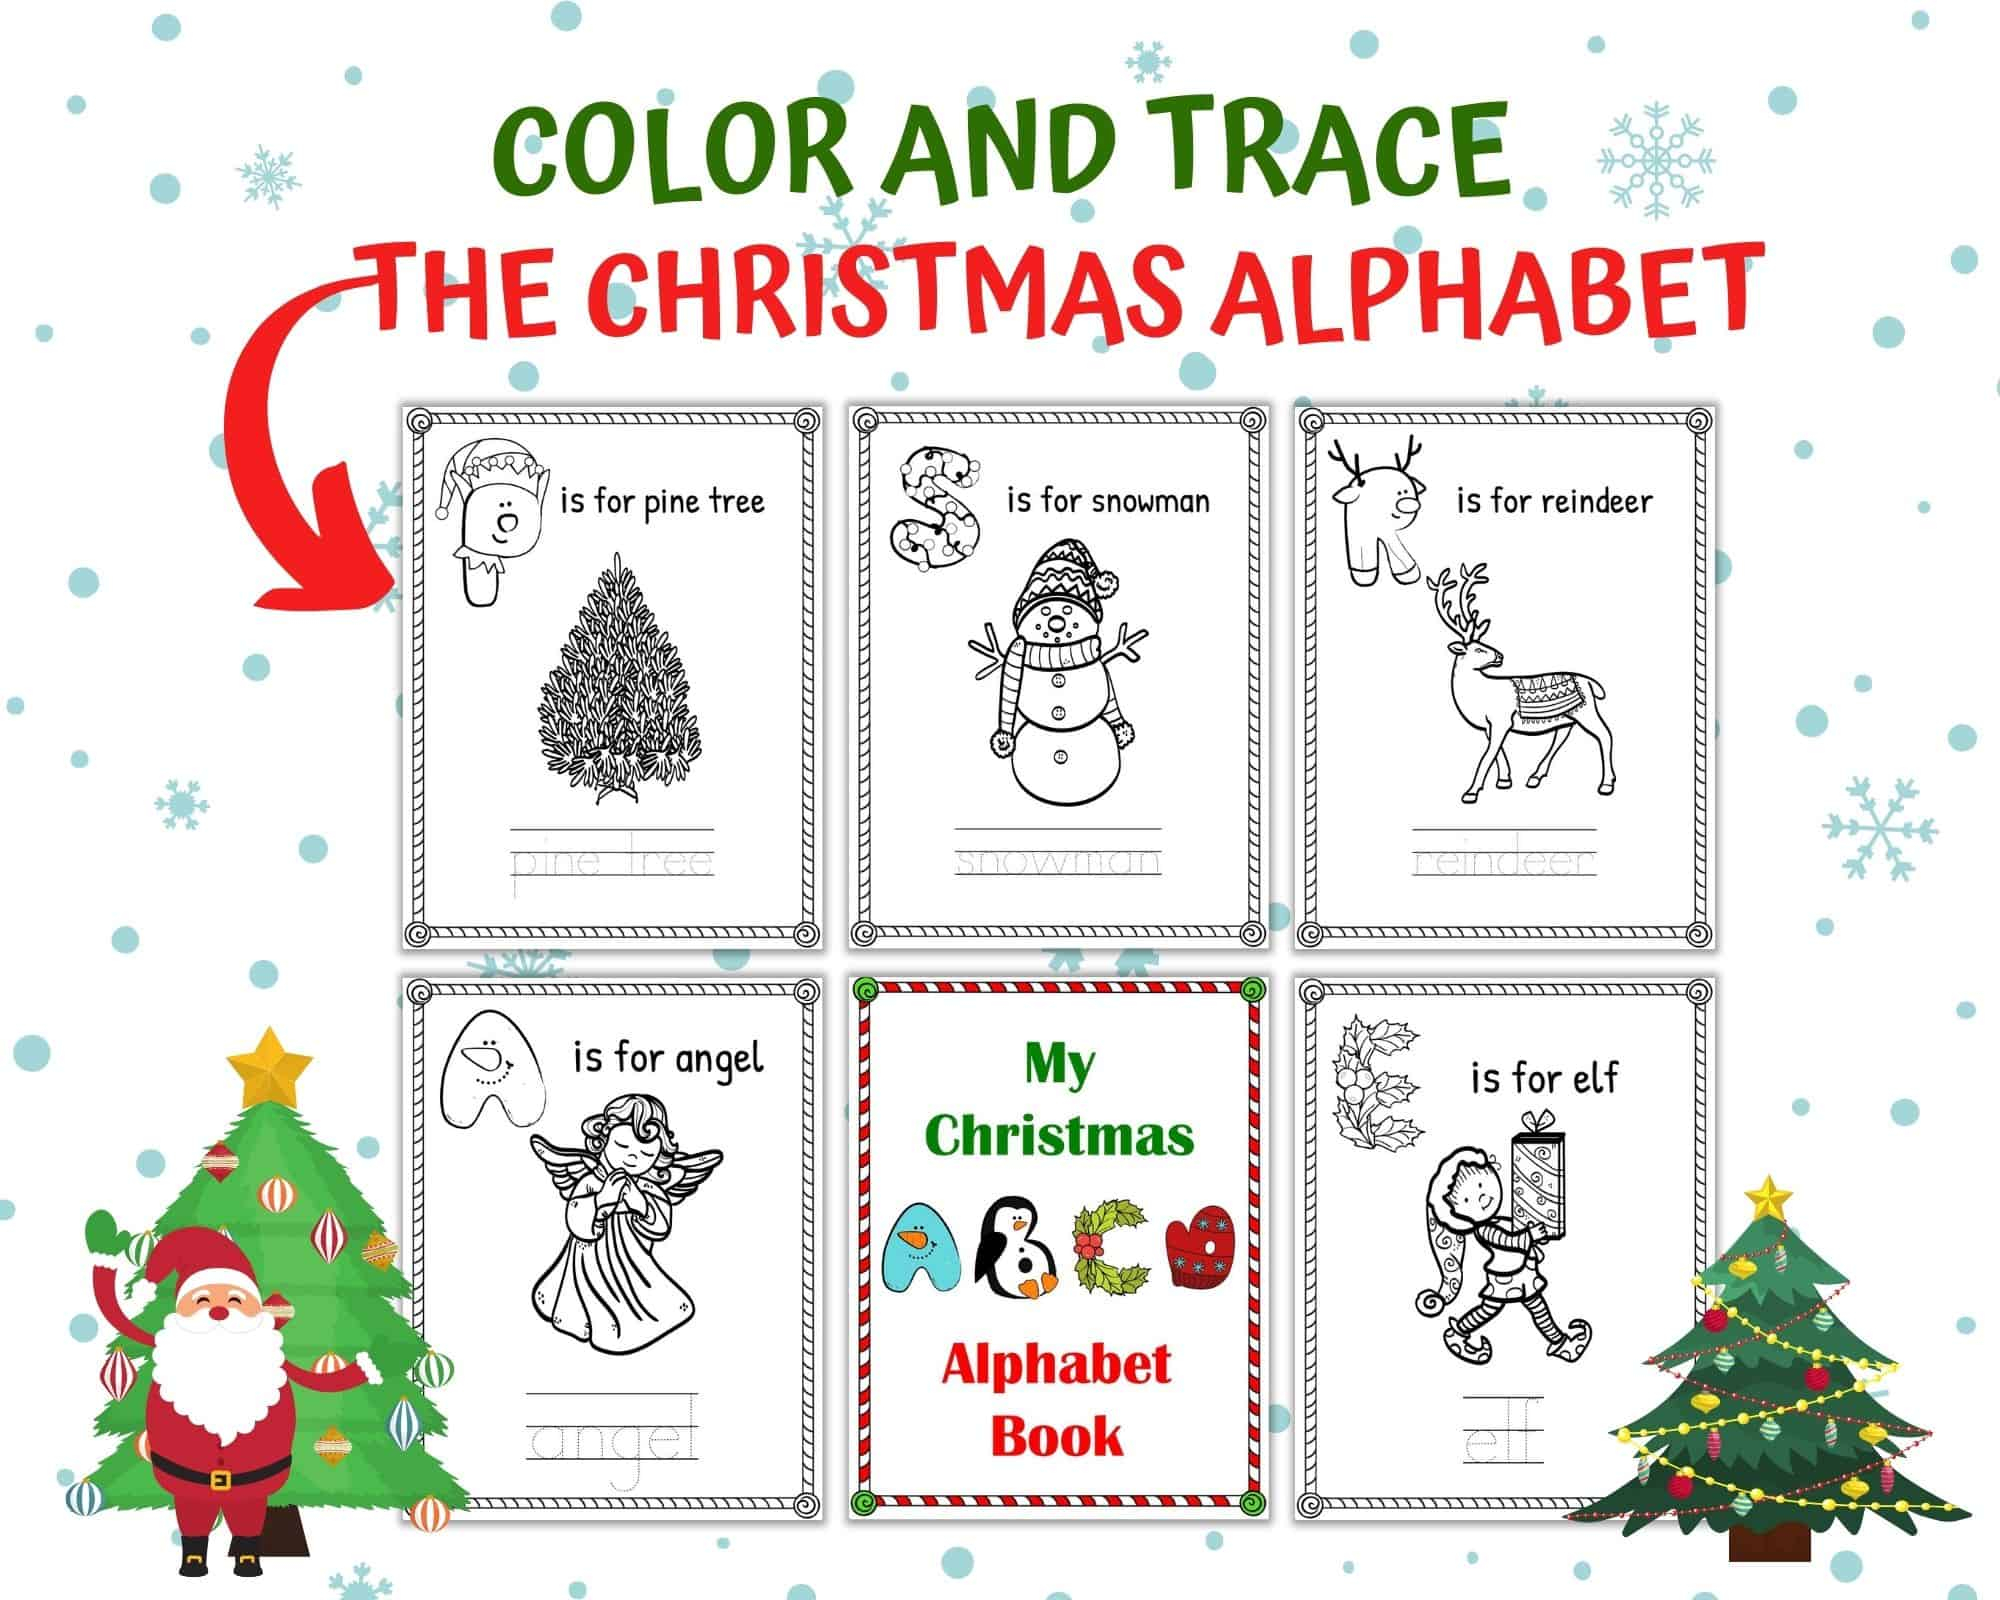 Free Christmas Alphabet Worksheets For Kindergarten | One